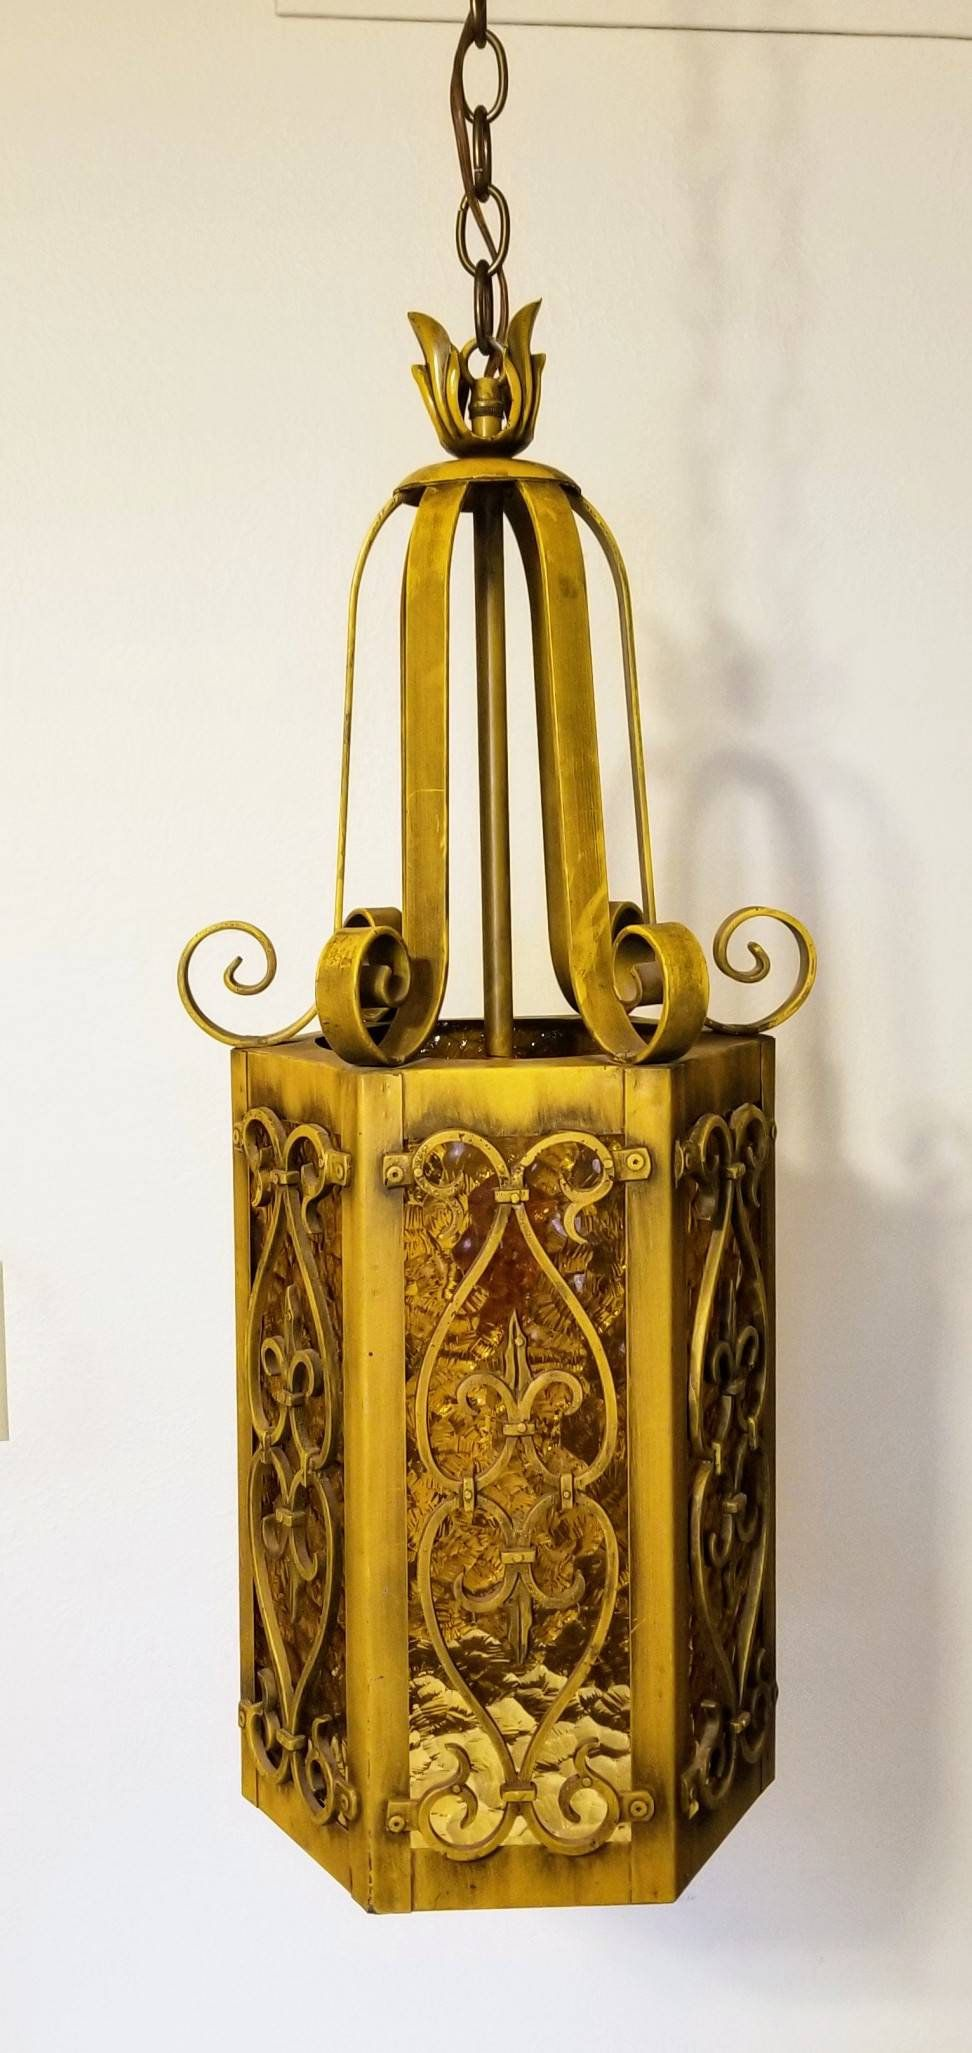 Retro Swag Hanging Lamp Enameled Metal Finish With 6 Pressed Etsy Hanging Lamp Amber Glass Metal Lamp